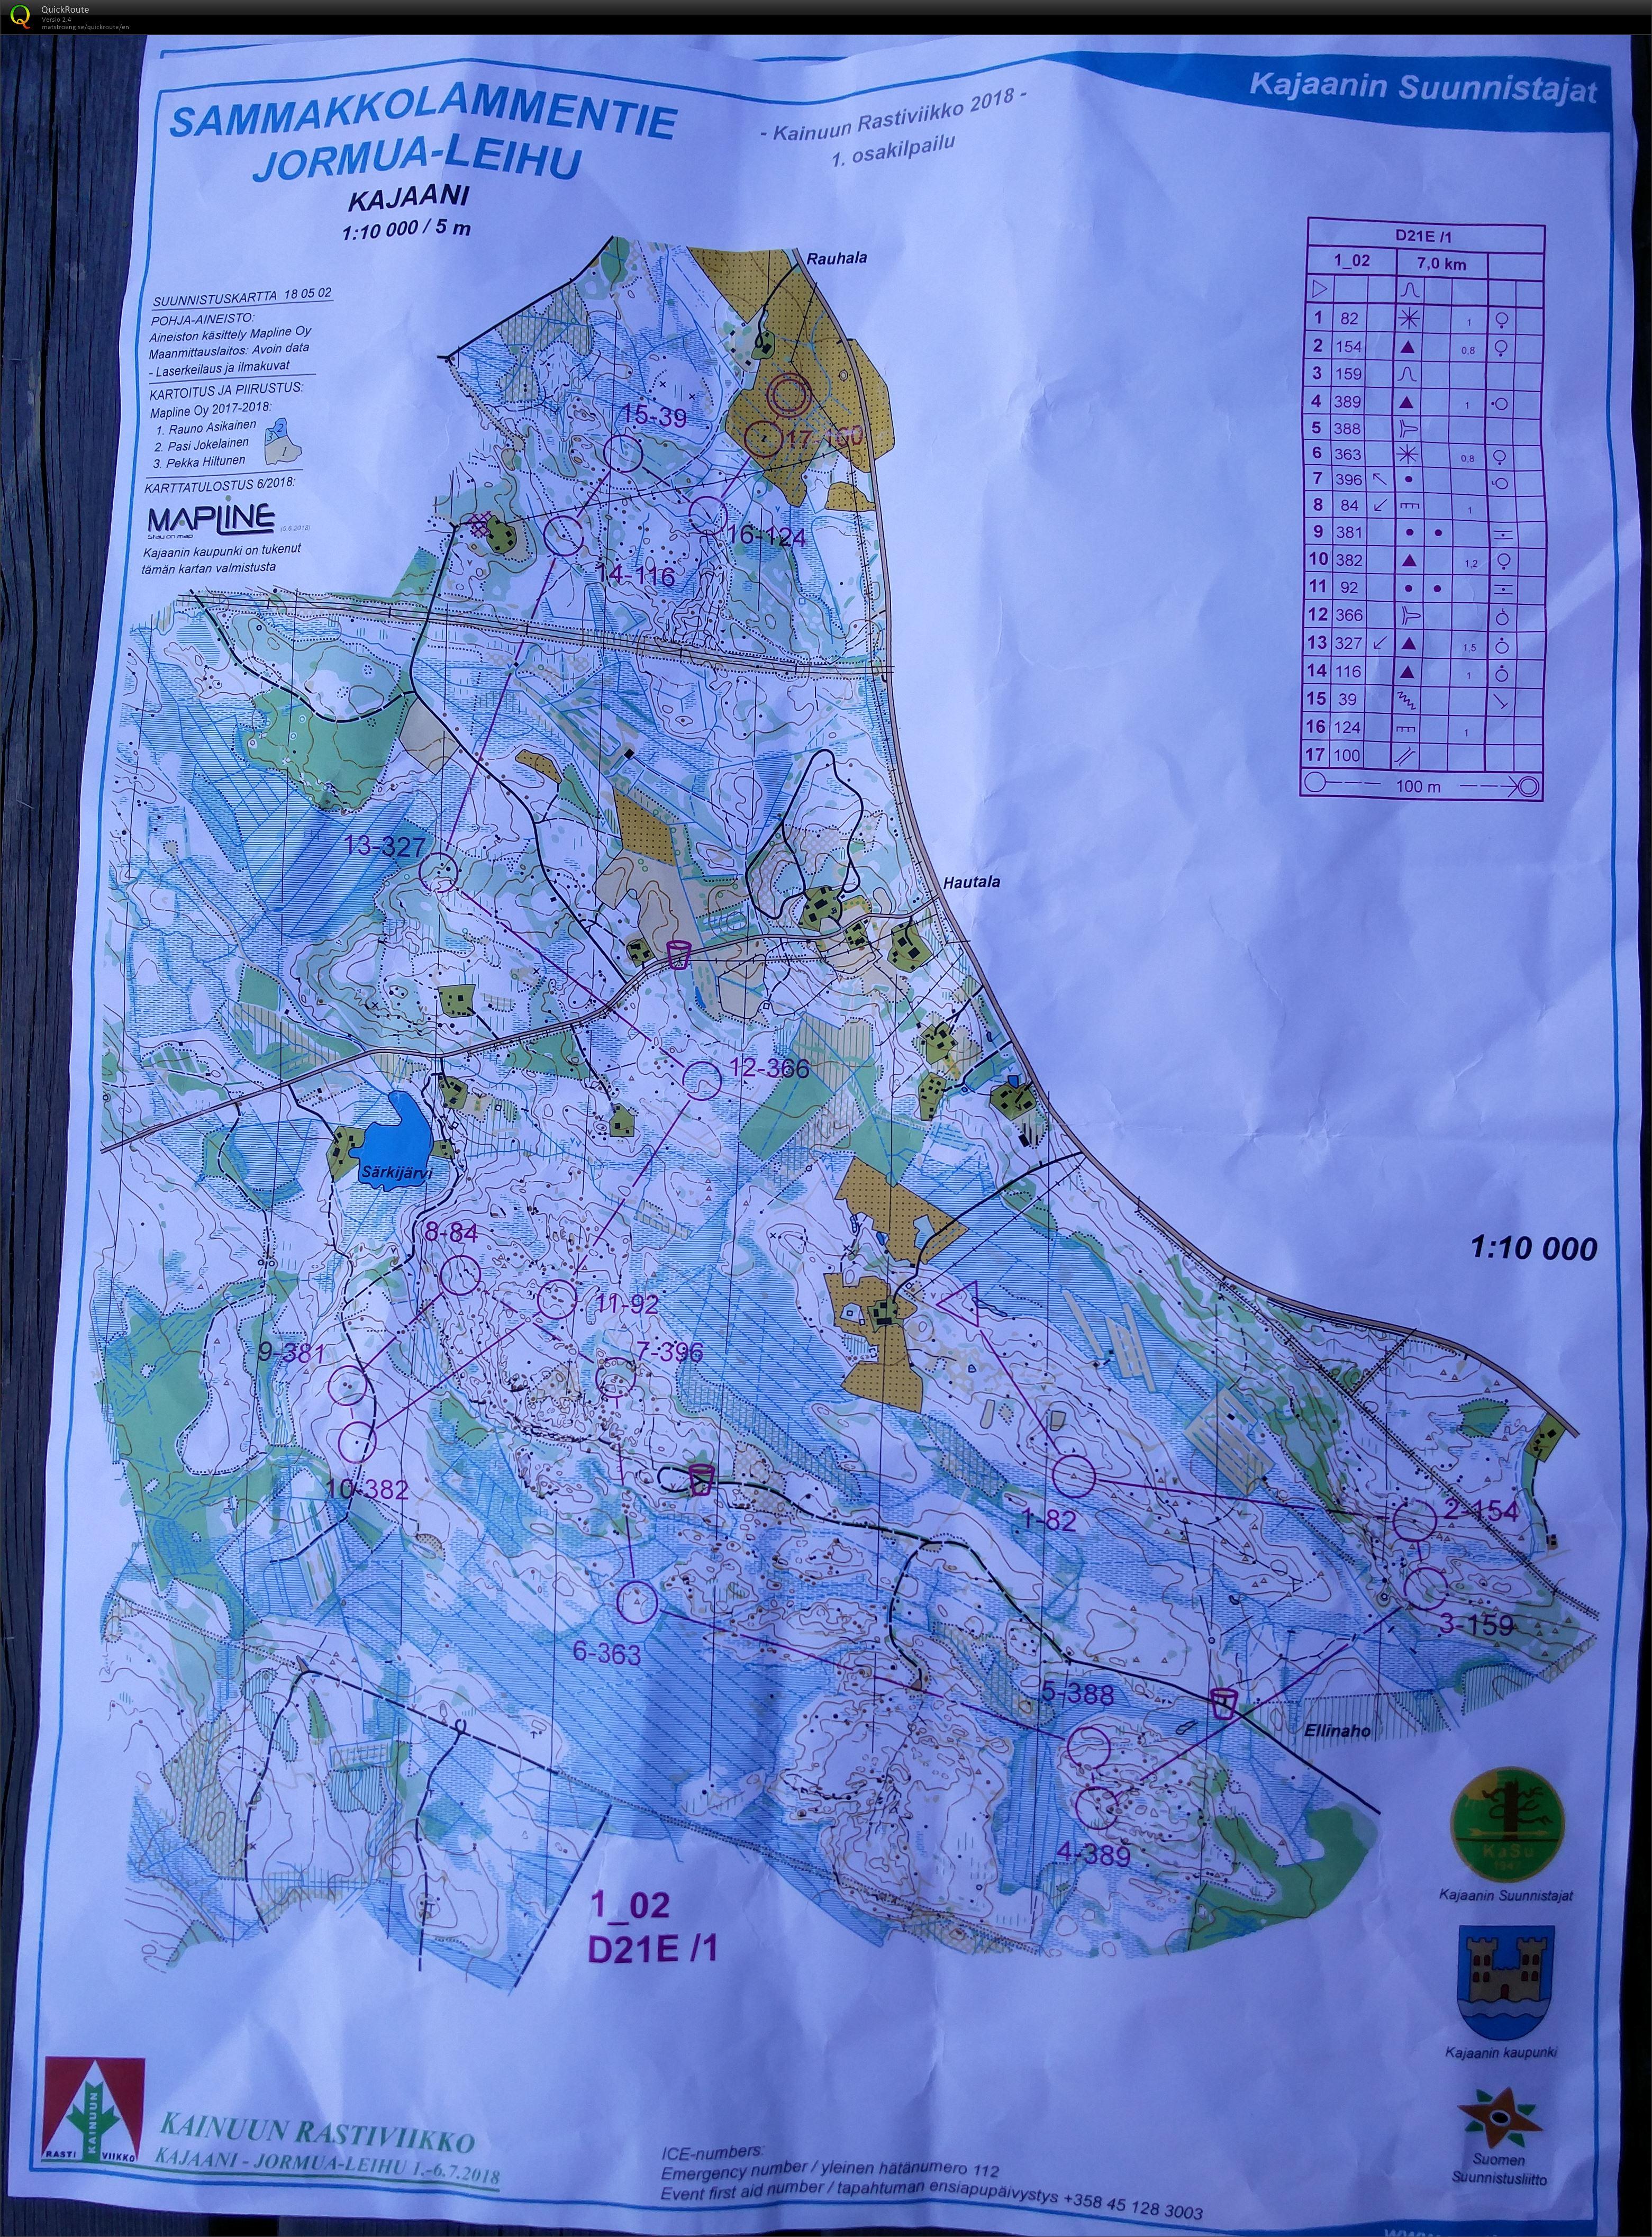 Krv 1 July 1st 2018 Orienteering Map From Milla Lohikainen